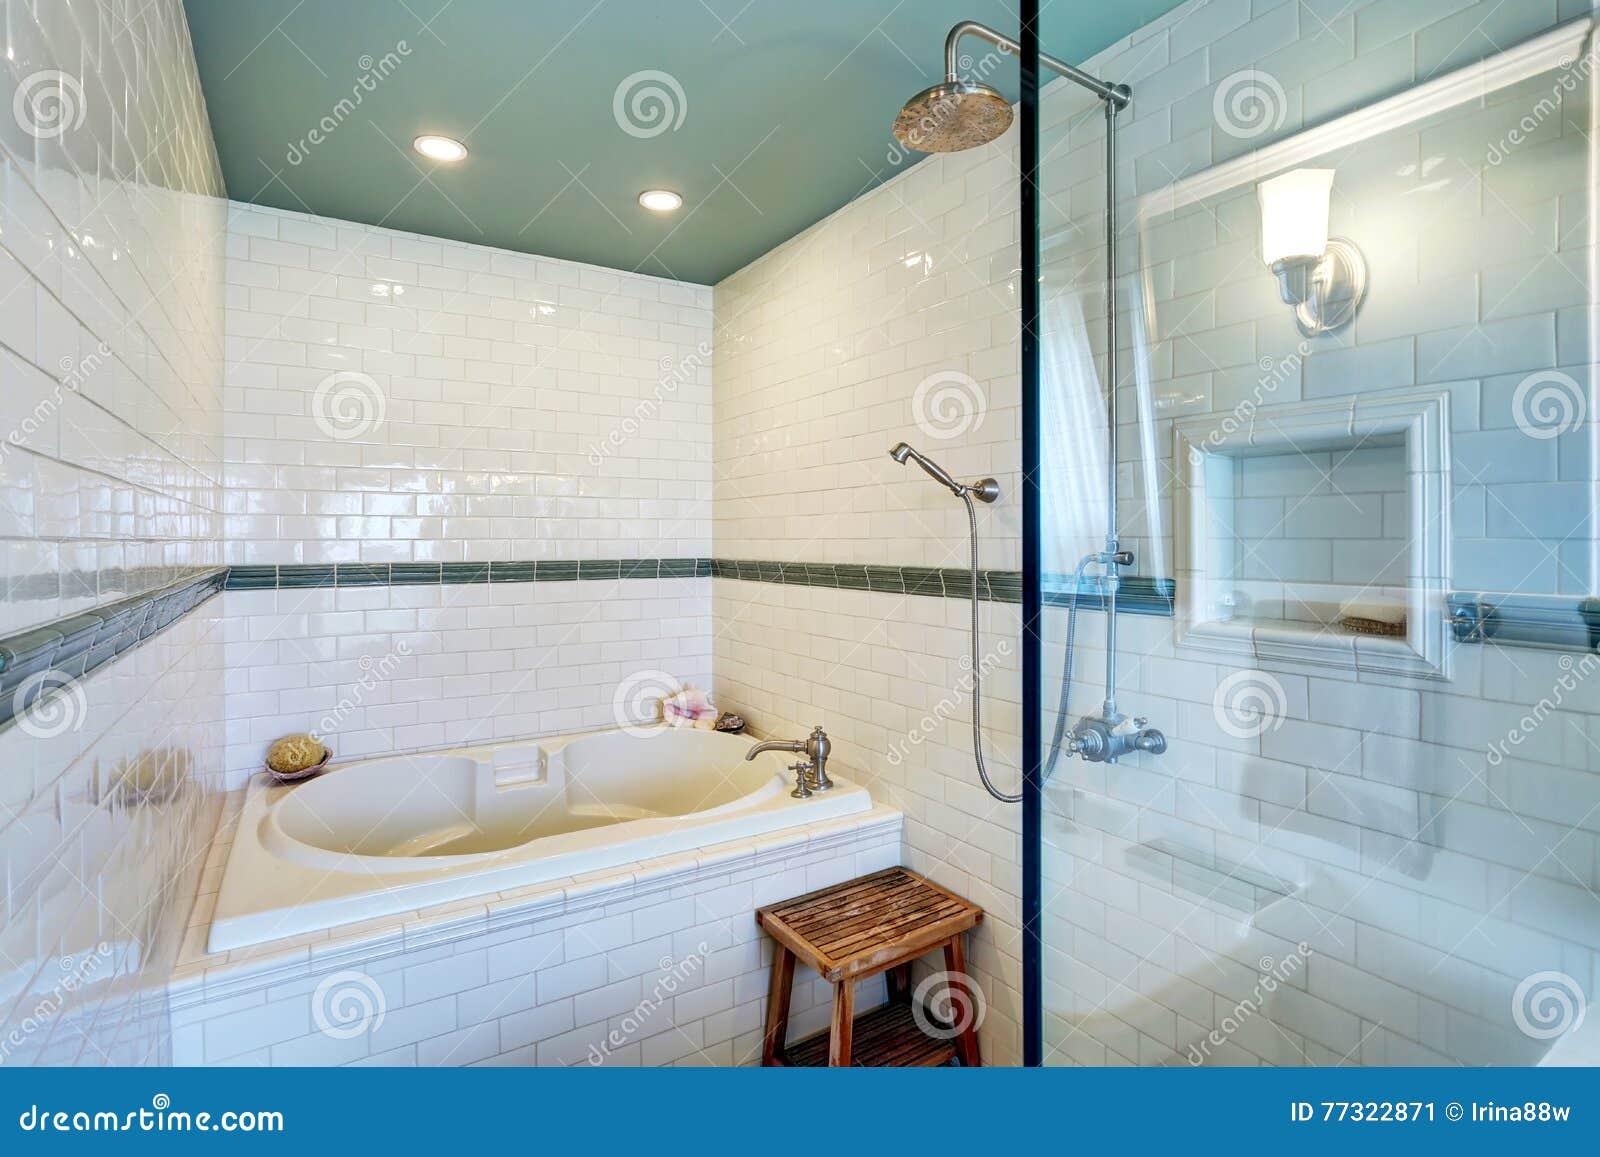 Parete in vetro per vasca da bagno - Vasca da bagno grigia ...